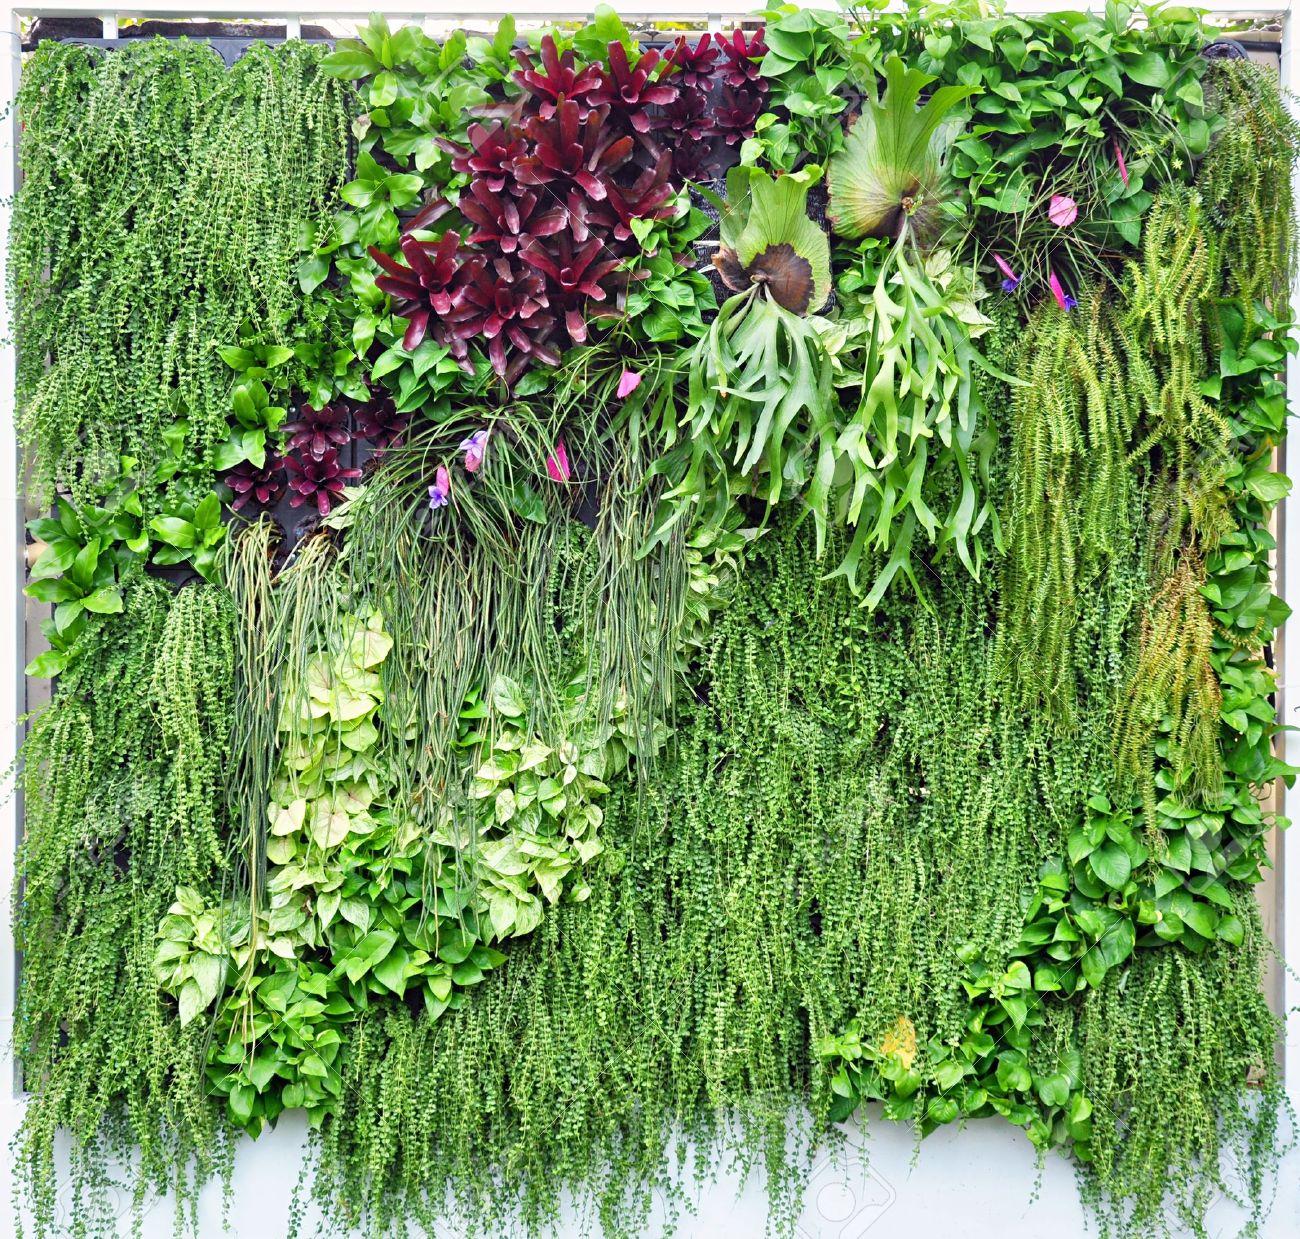 tropische pflanzen in vertikaler garten lizenzfreie fotos, bilder